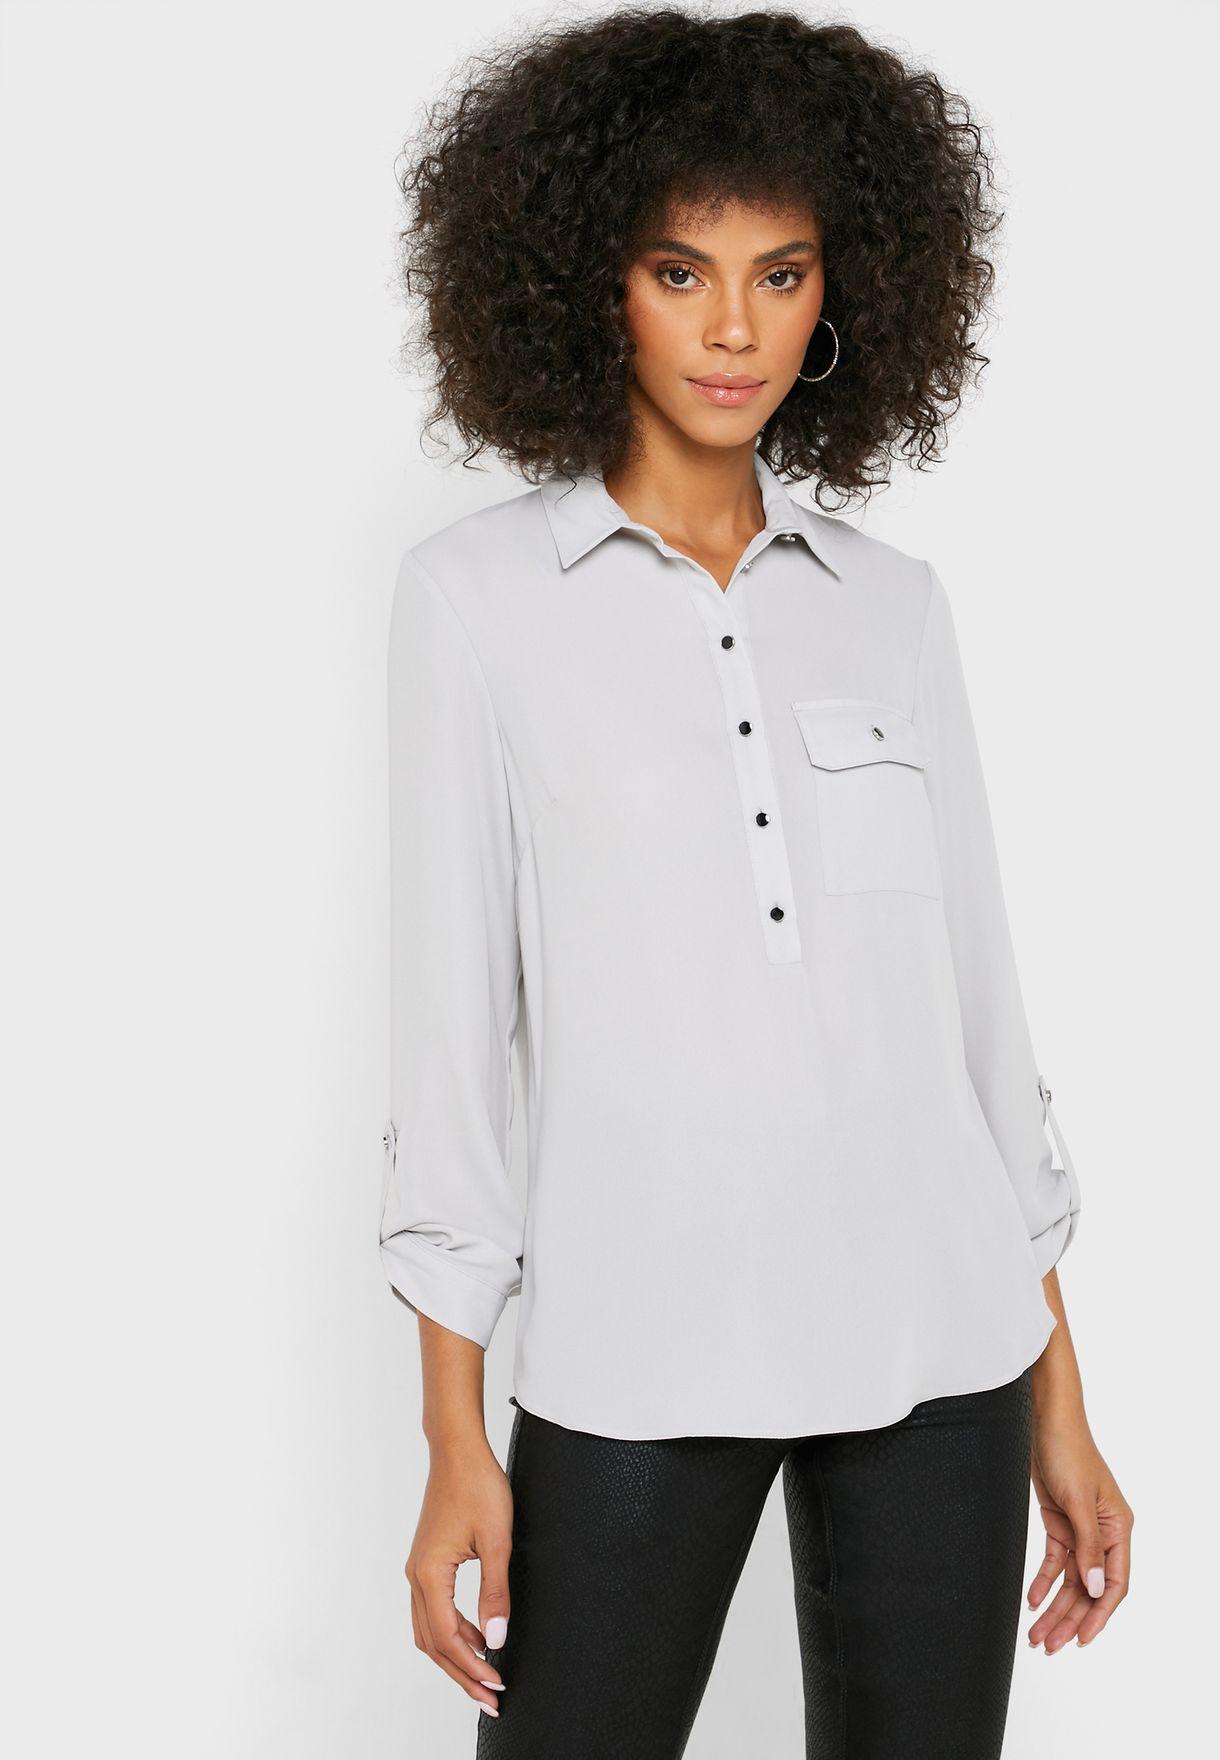 قميص بأكمام رول